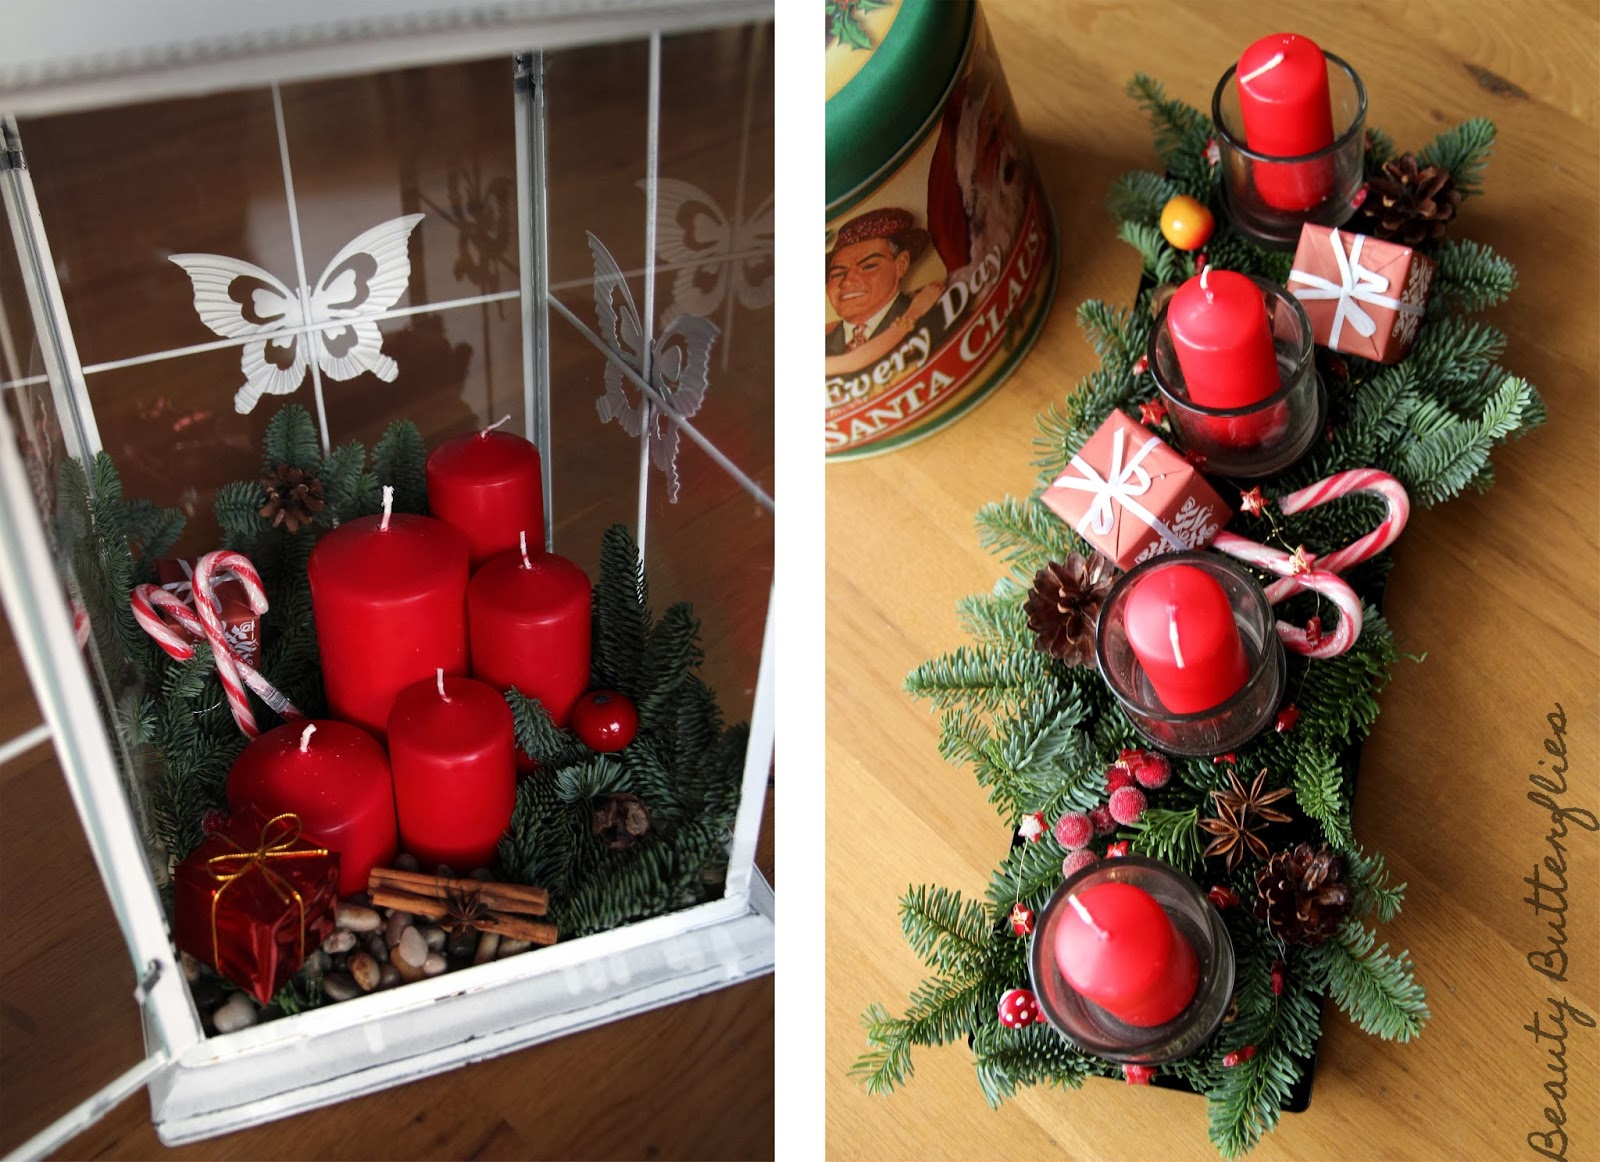 laterne dekorieren laterne deko deko weihnachten laterne gilde deko laterne. Black Bedroom Furniture Sets. Home Design Ideas